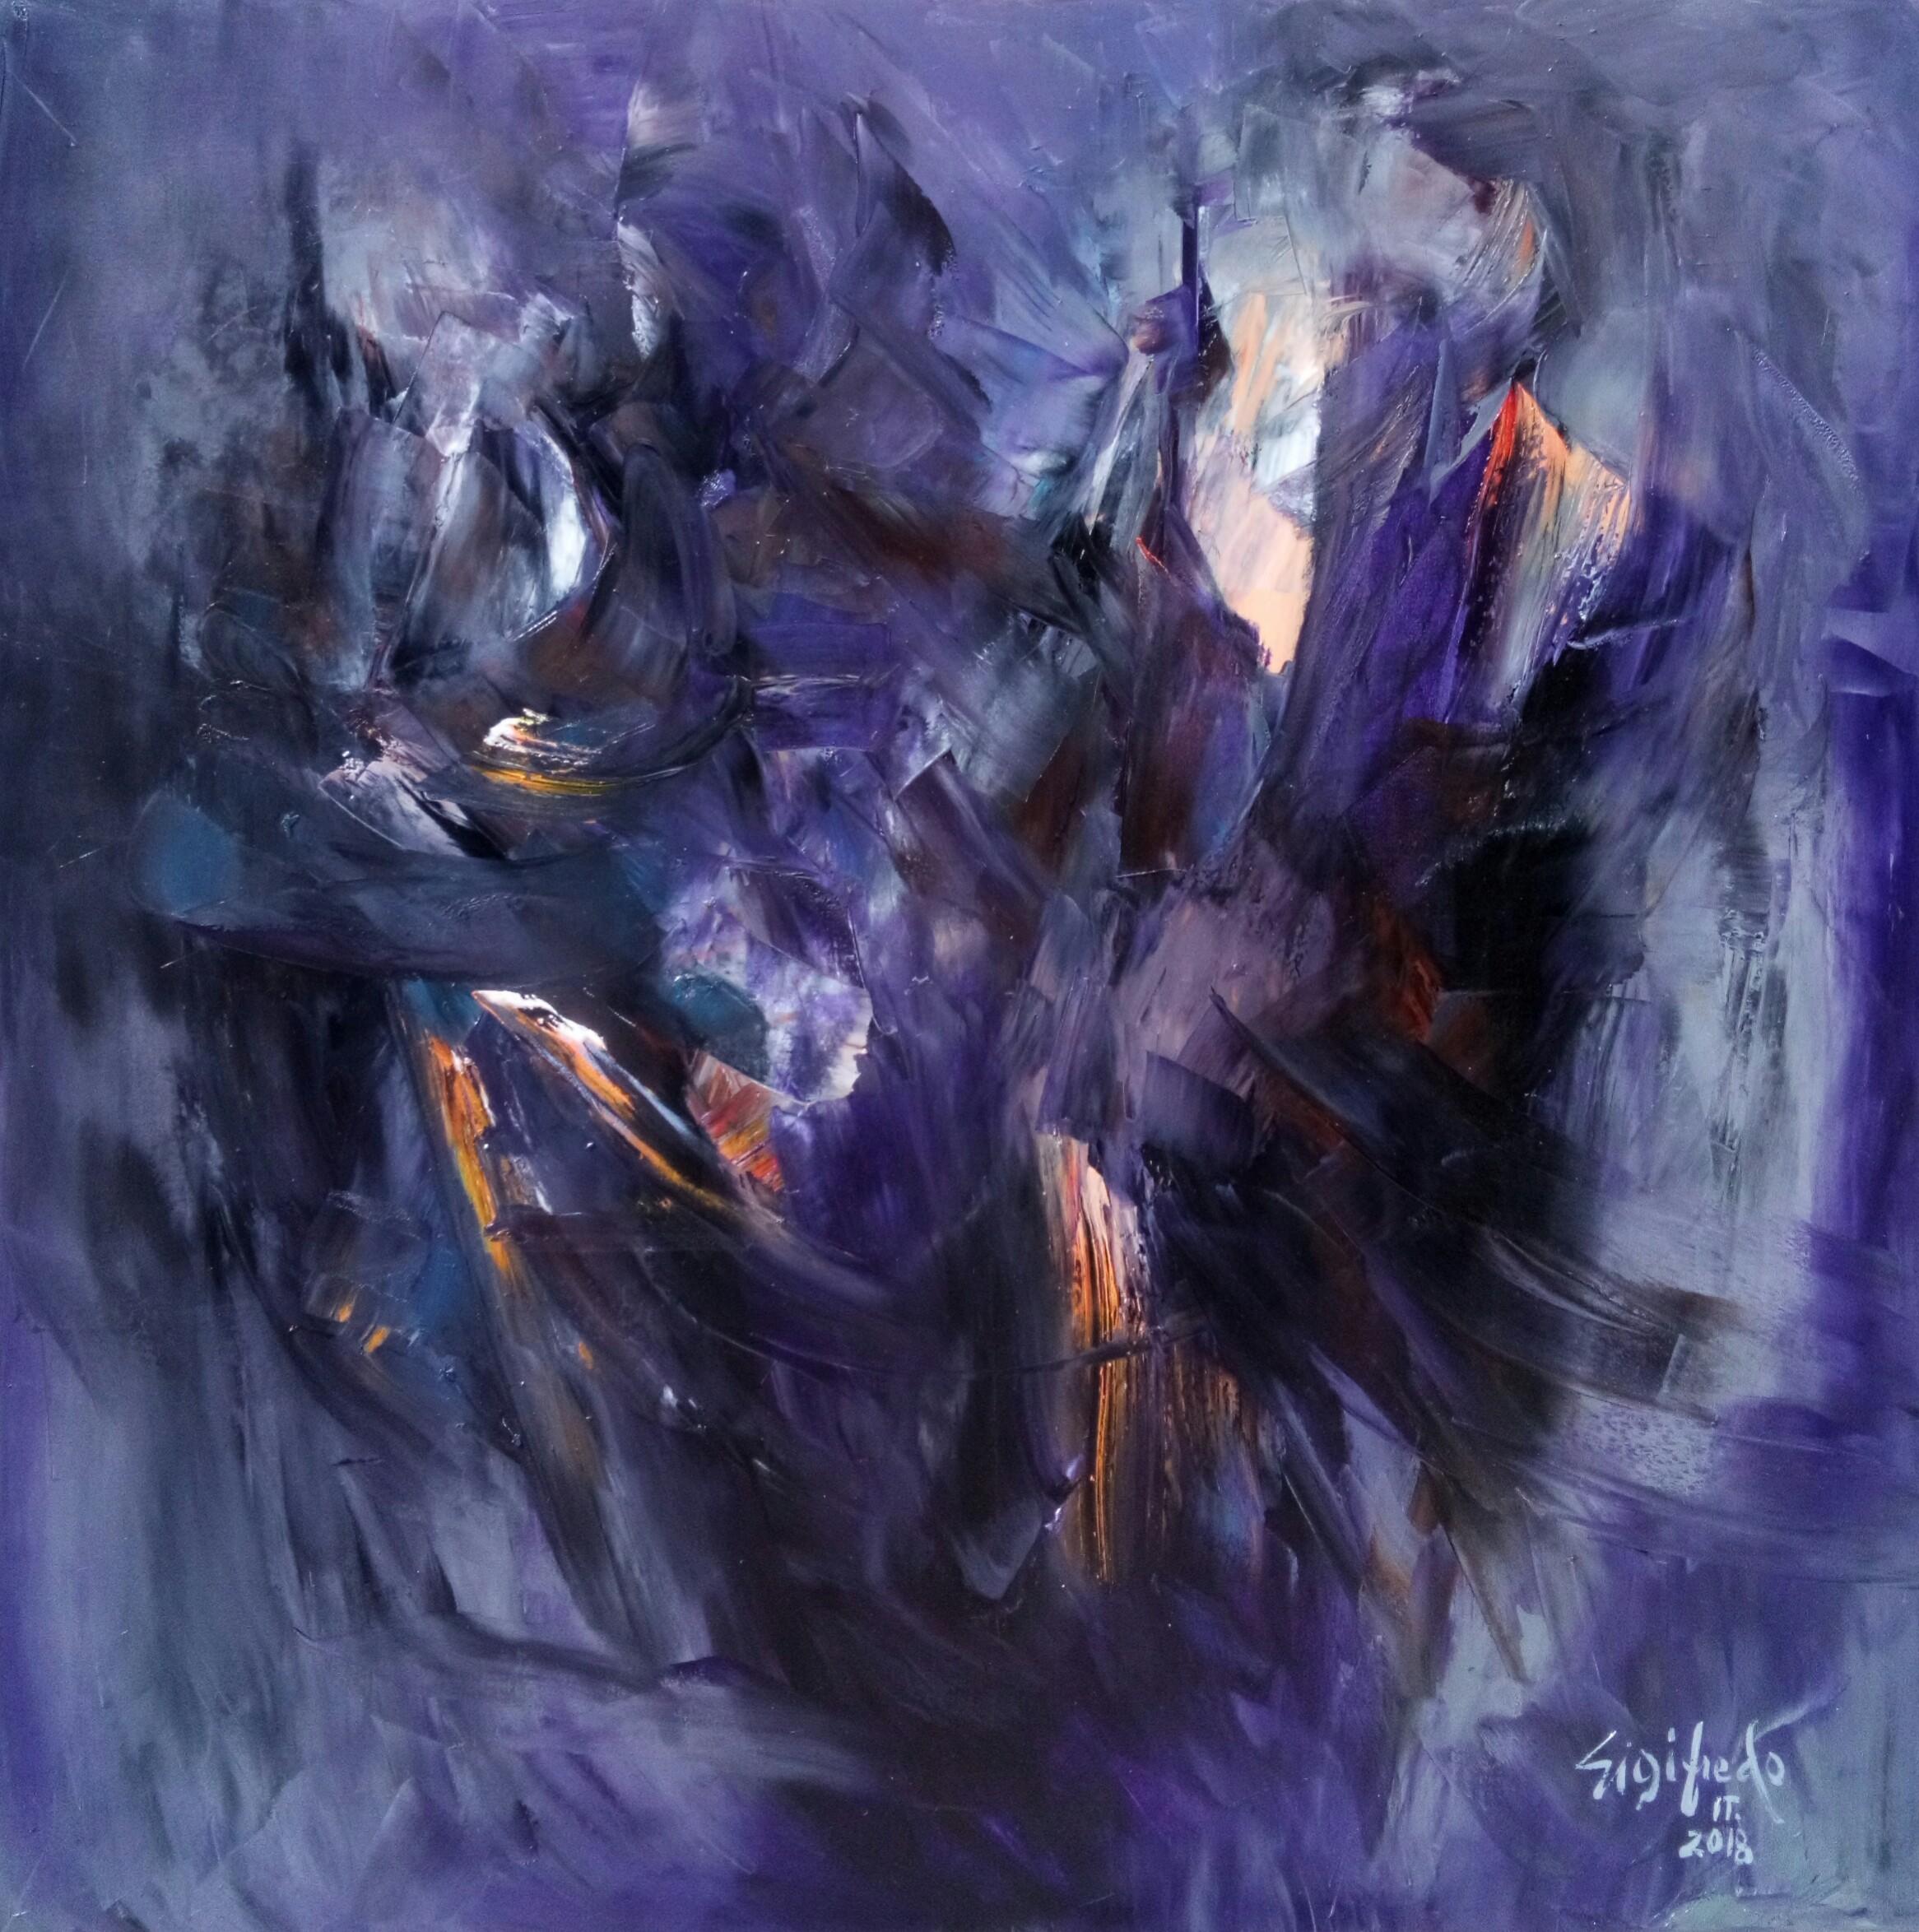 Nightmare - Original Abstract Wall Art by Sigifredo